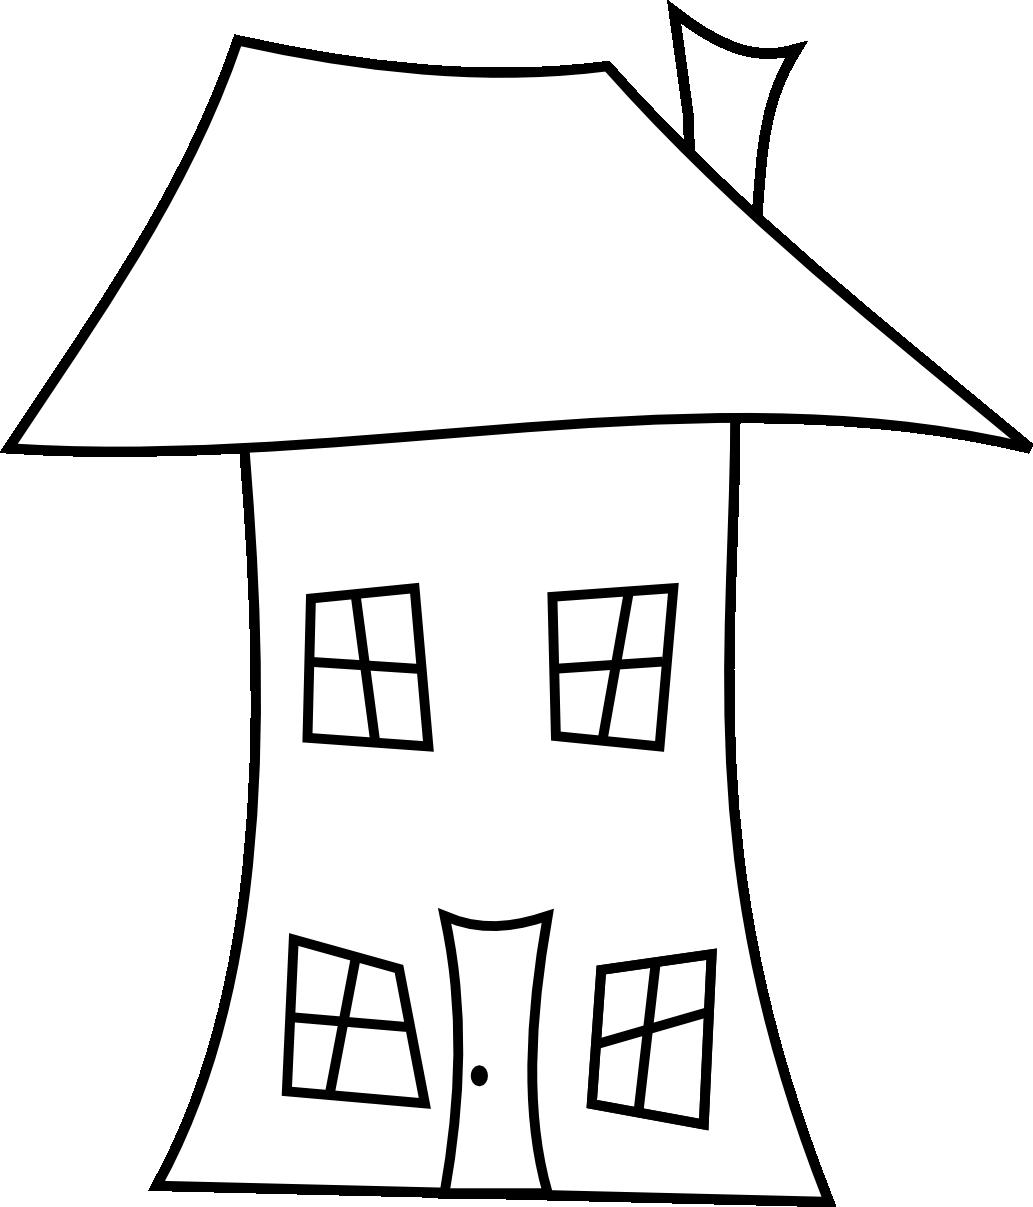 Adoration panda free images. Clipart houses doodle